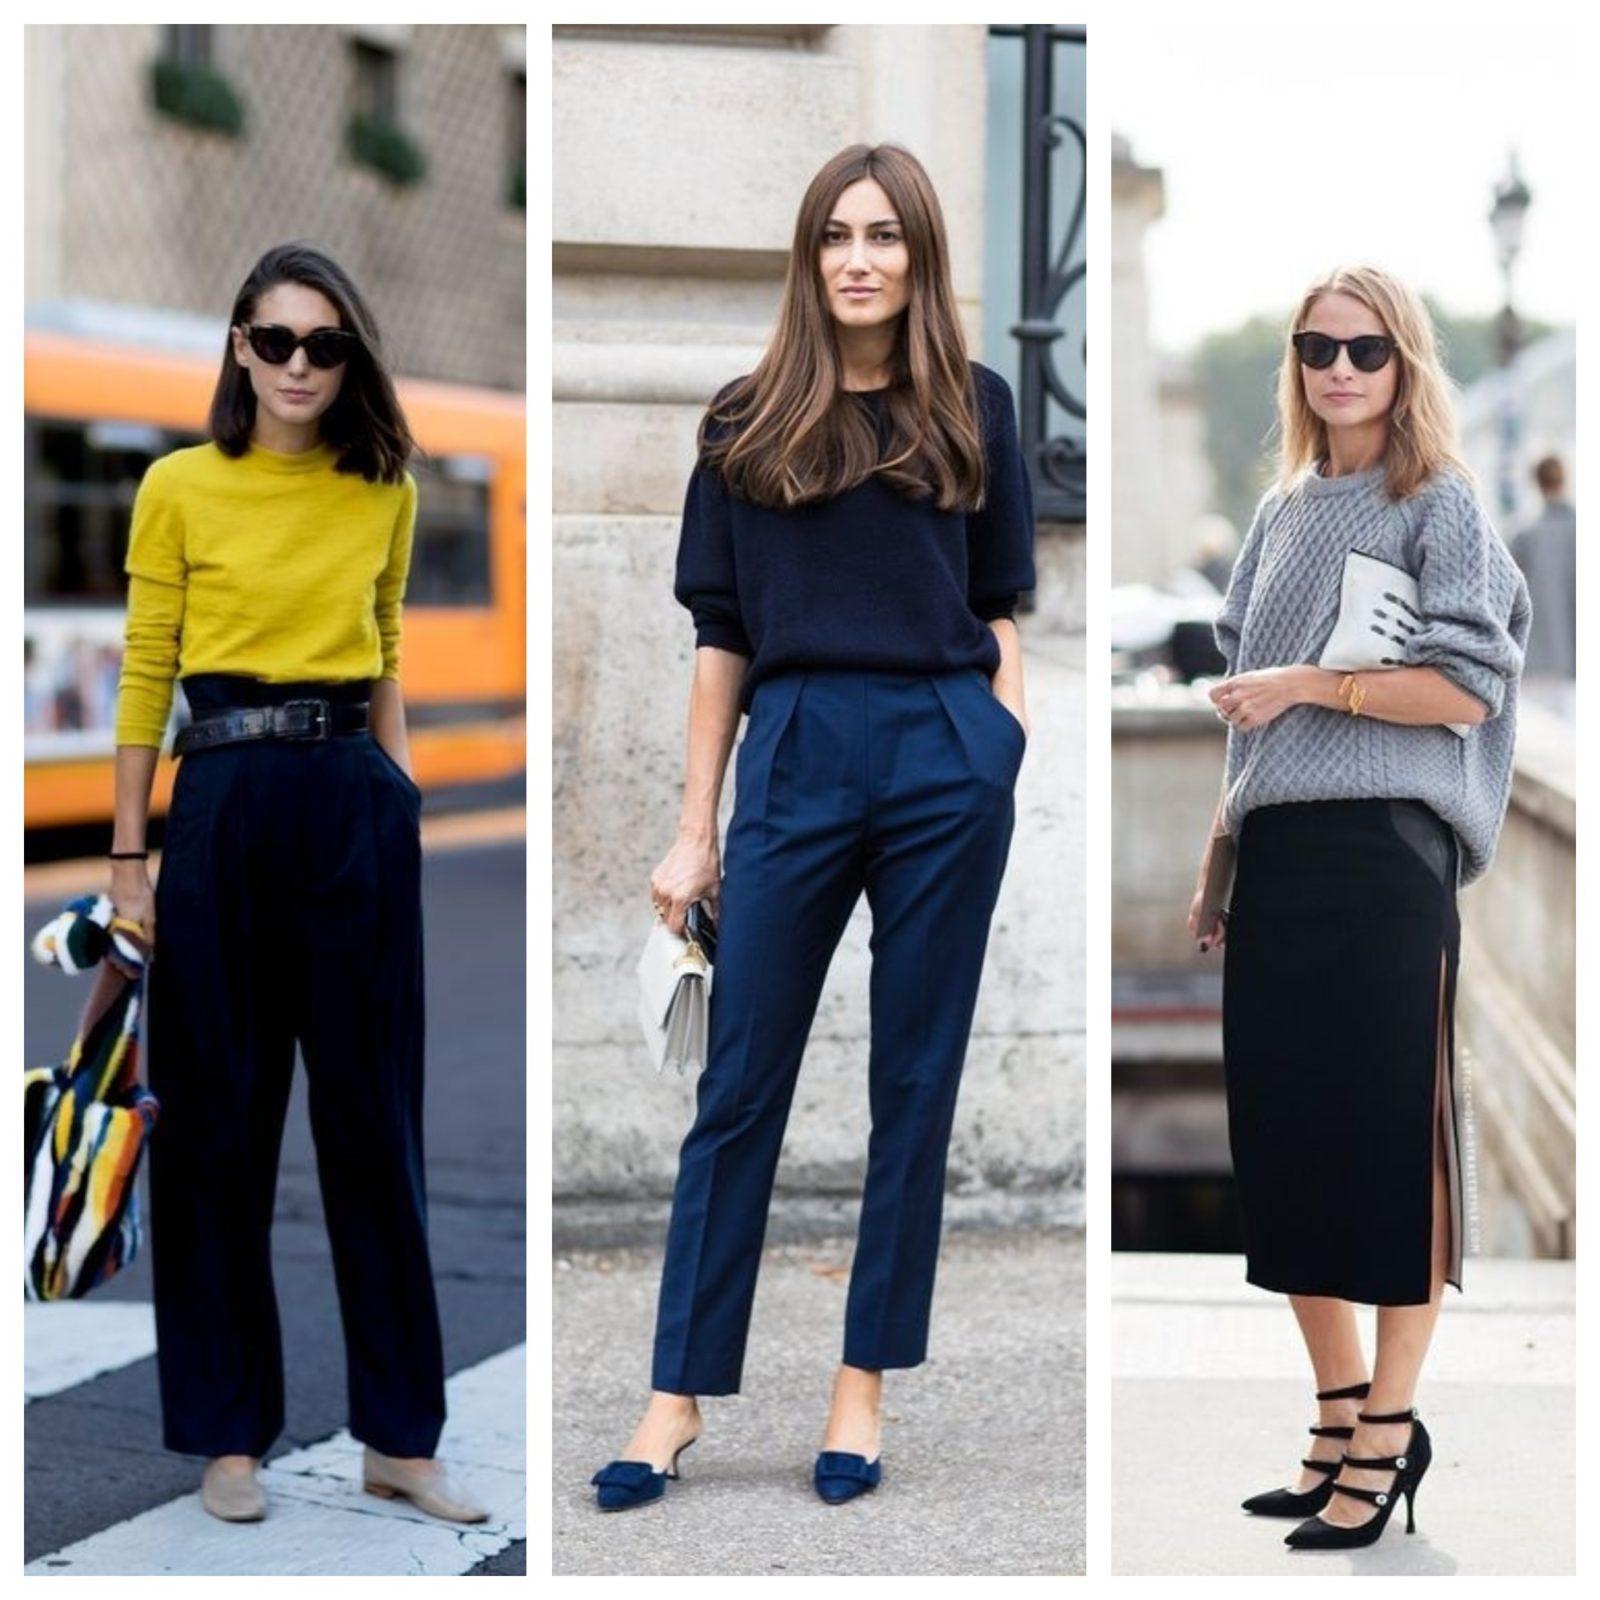 Spring/ Summer 2018 Fashion Trends 74